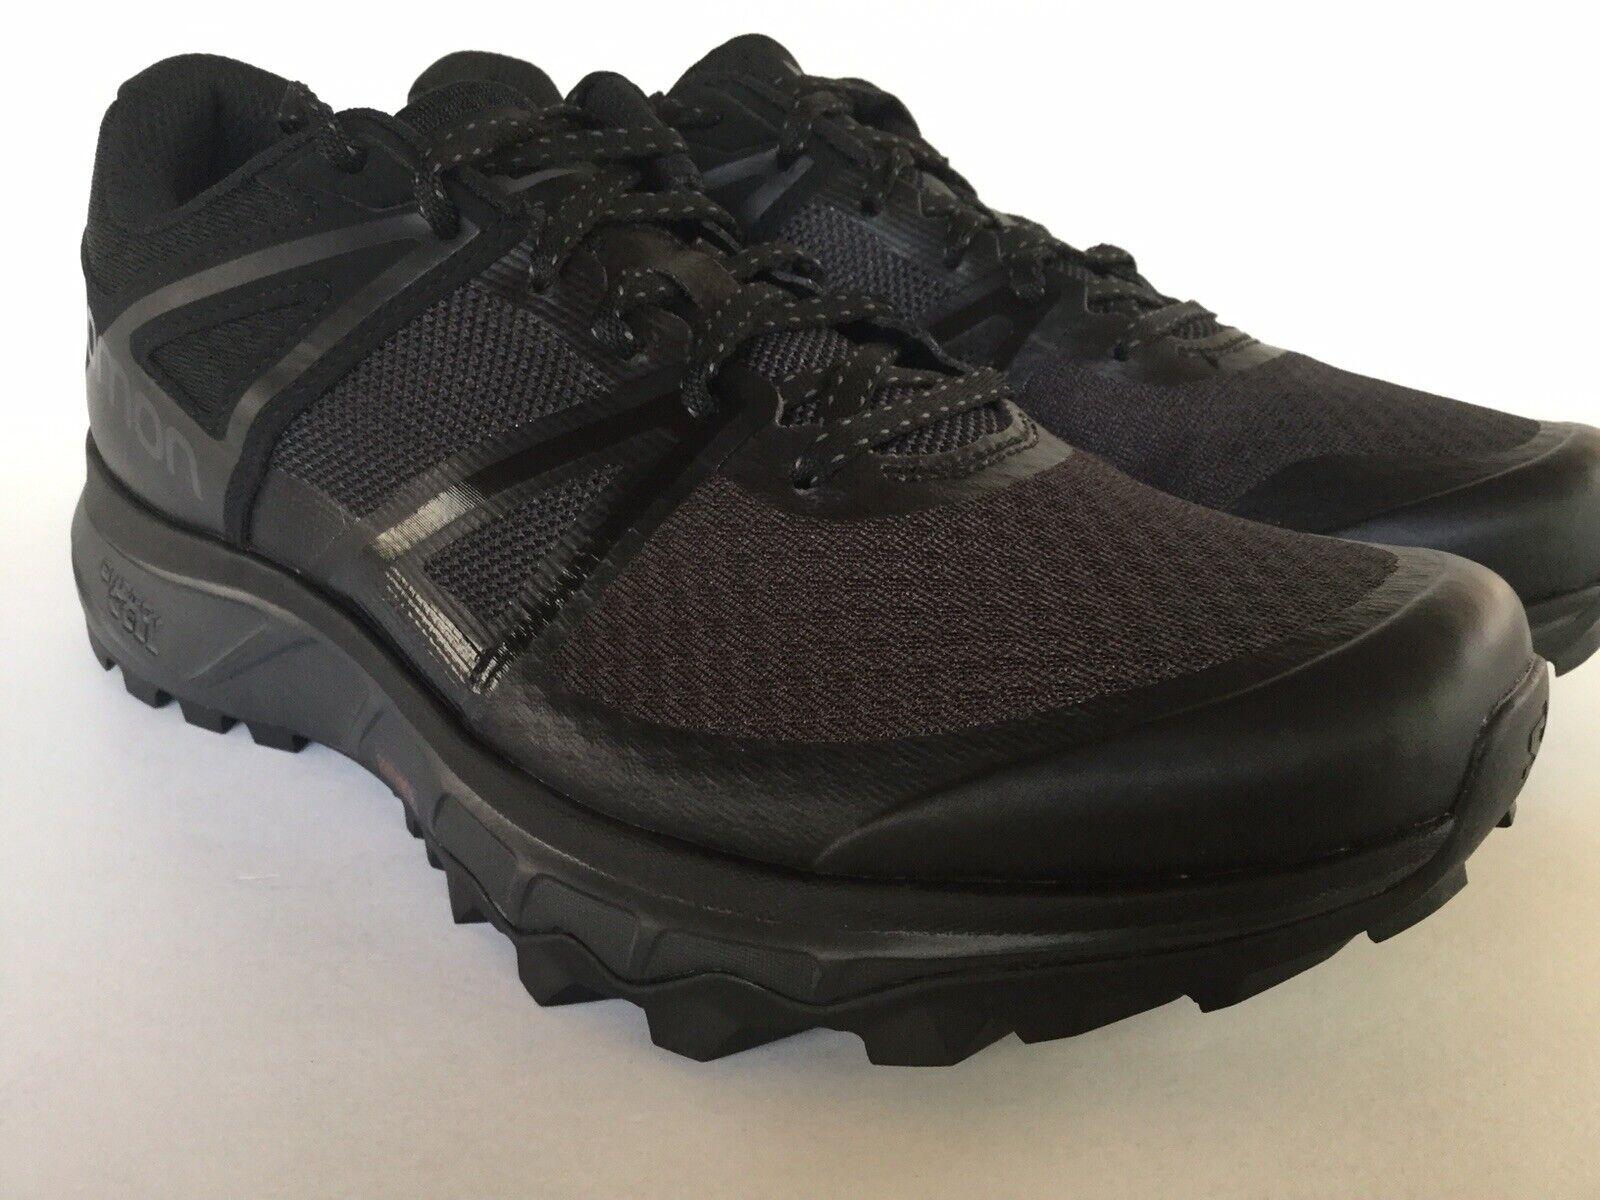 Salomon Evasion Leather Gore Tex Men/'s Hiking Shoes Outdoor Trekking Shoes